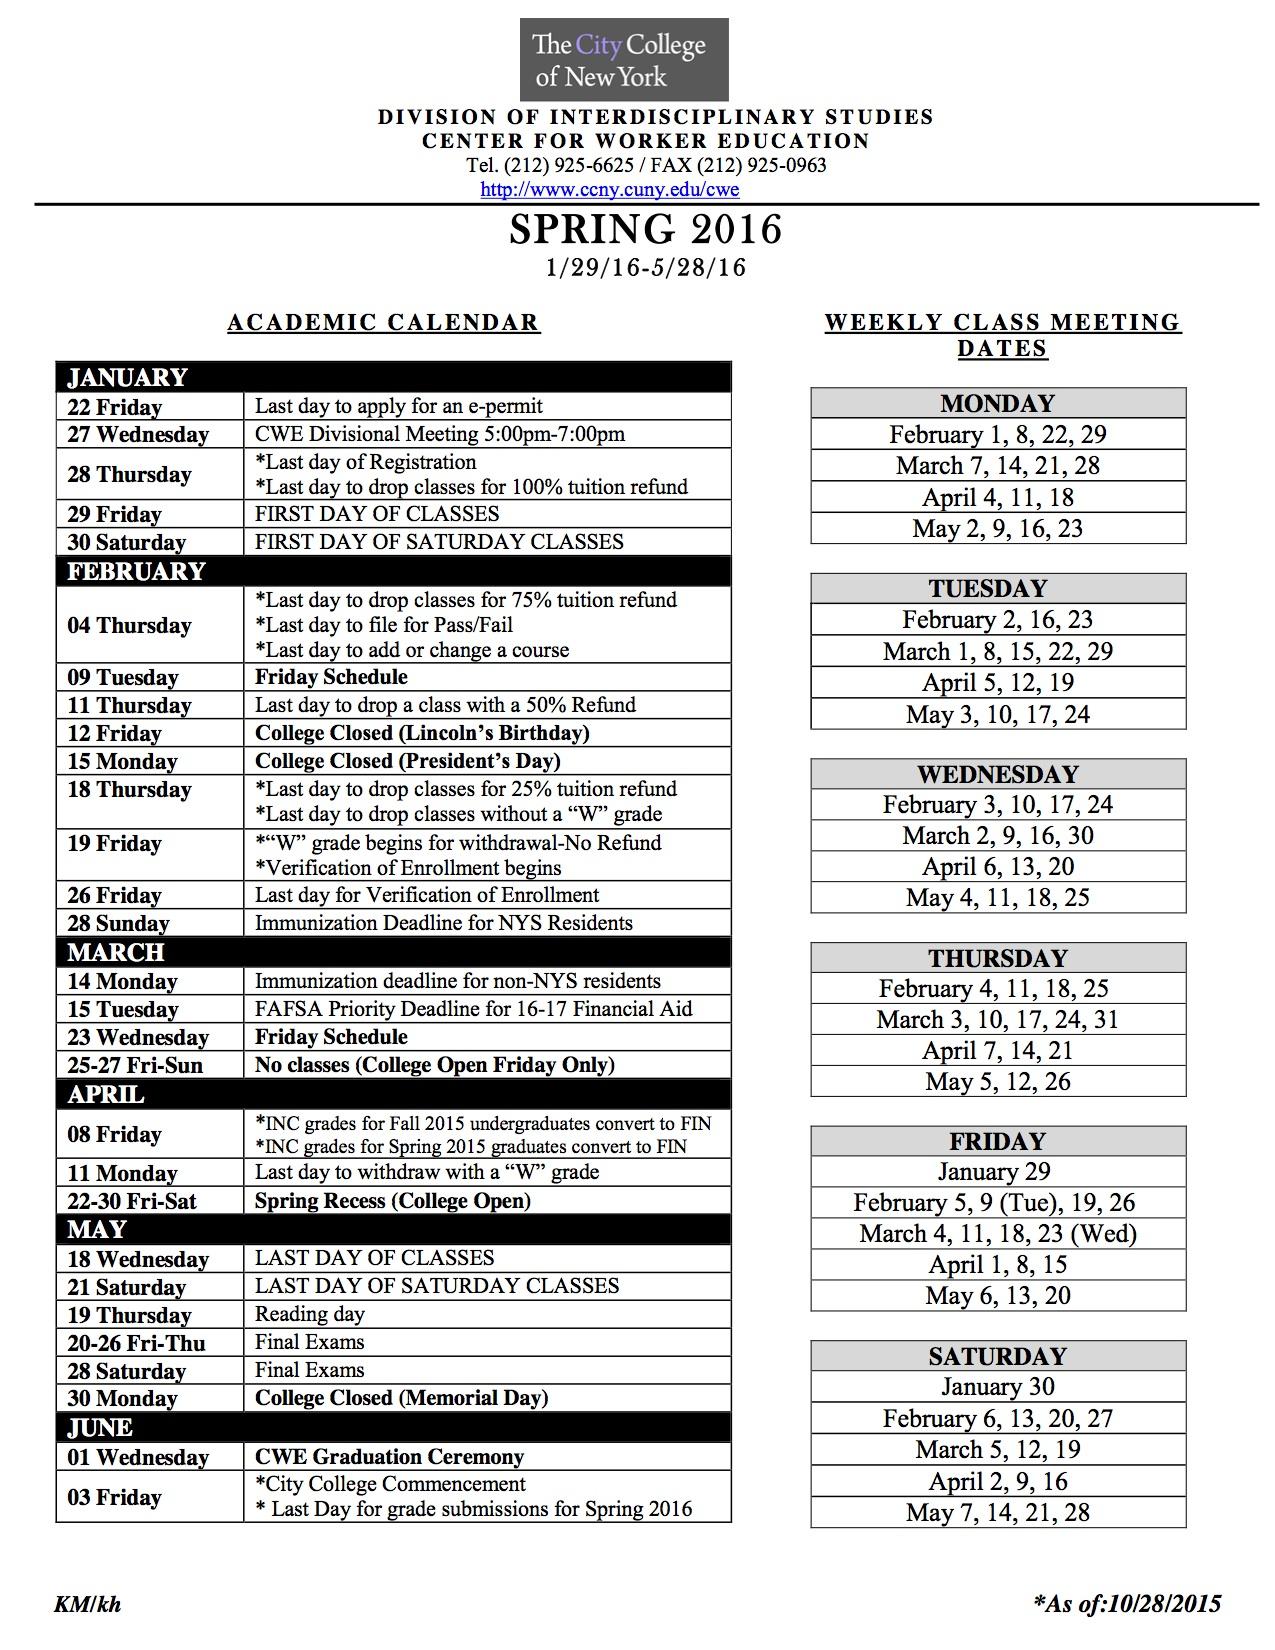 Academic Calendar | The City College Of New York inside Queensborugh Commuity College Calendar